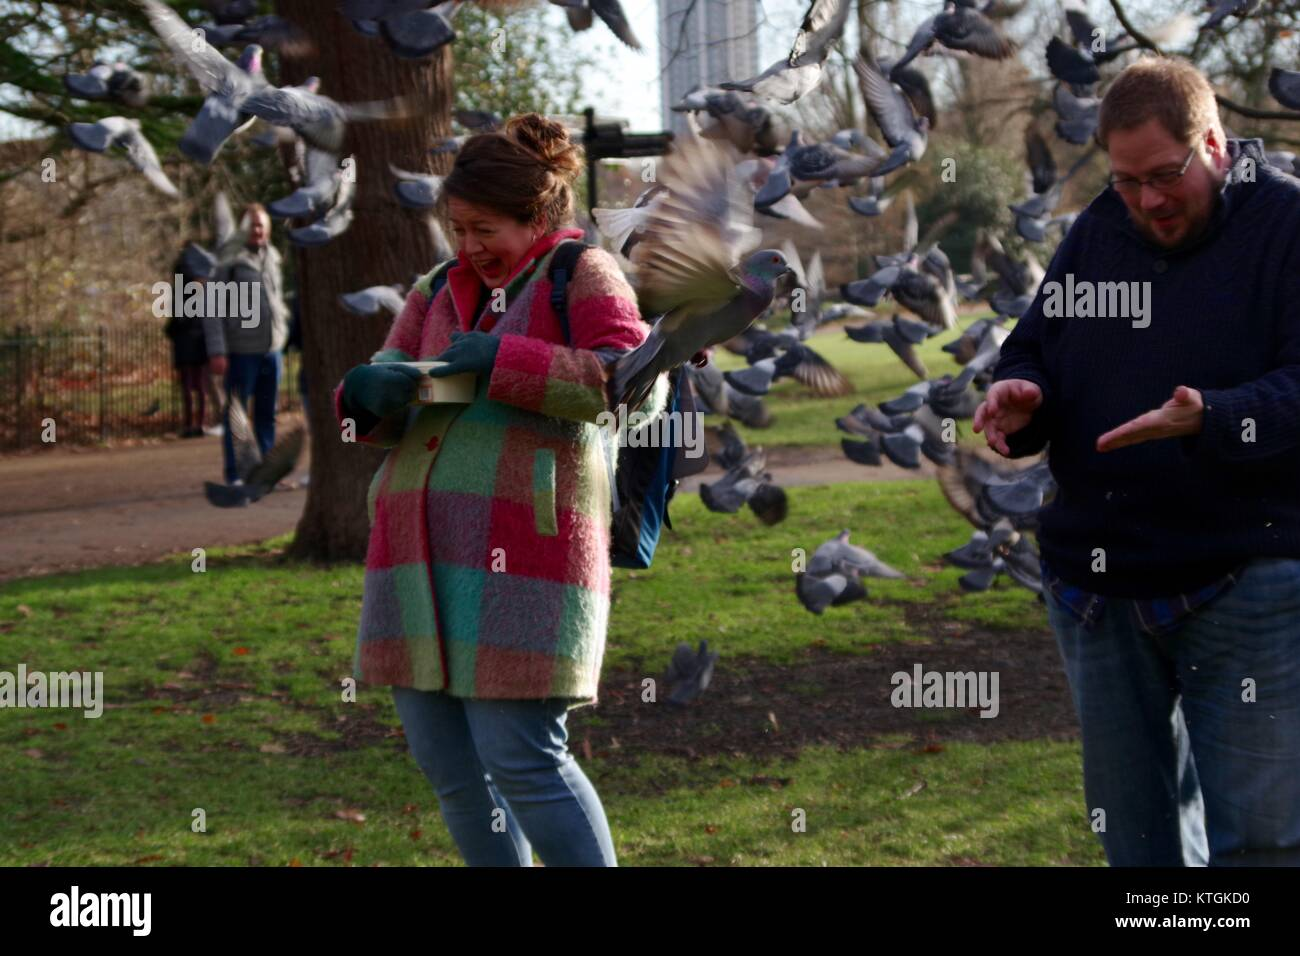 Pigeon Flock Takes to the Air, Surprising a Pair of Bird Feeders in Kensington Garden, London, UK. December 2017. - Stock Image